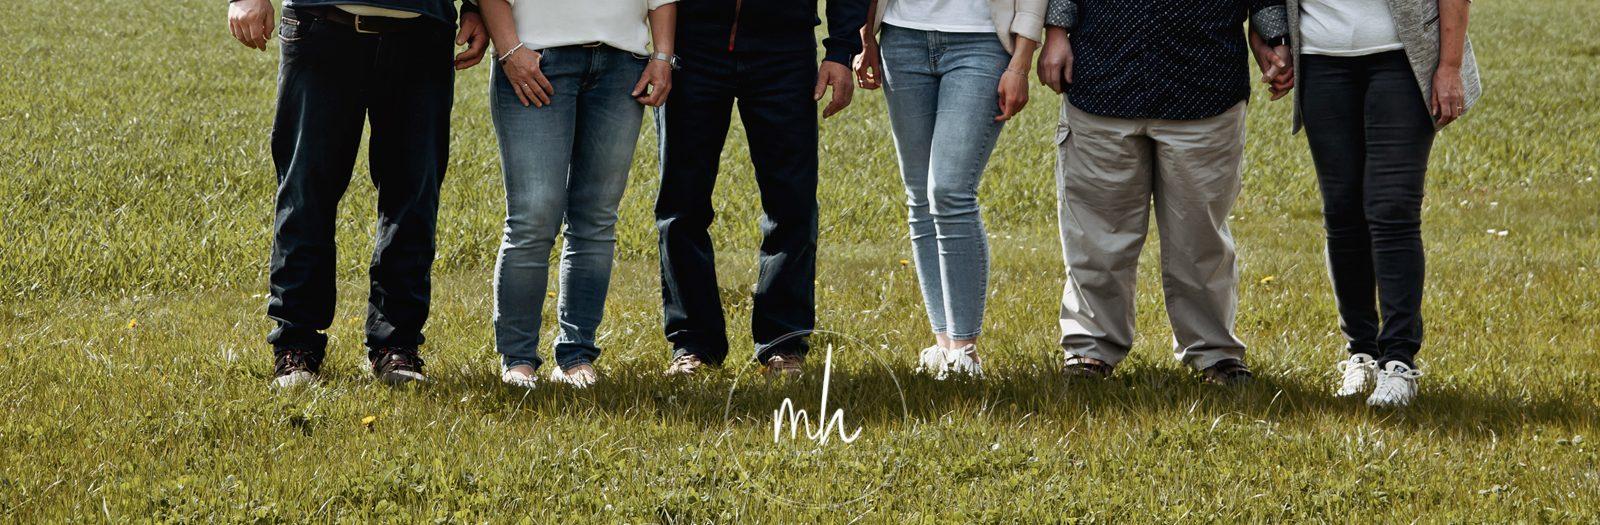 Julia & Family